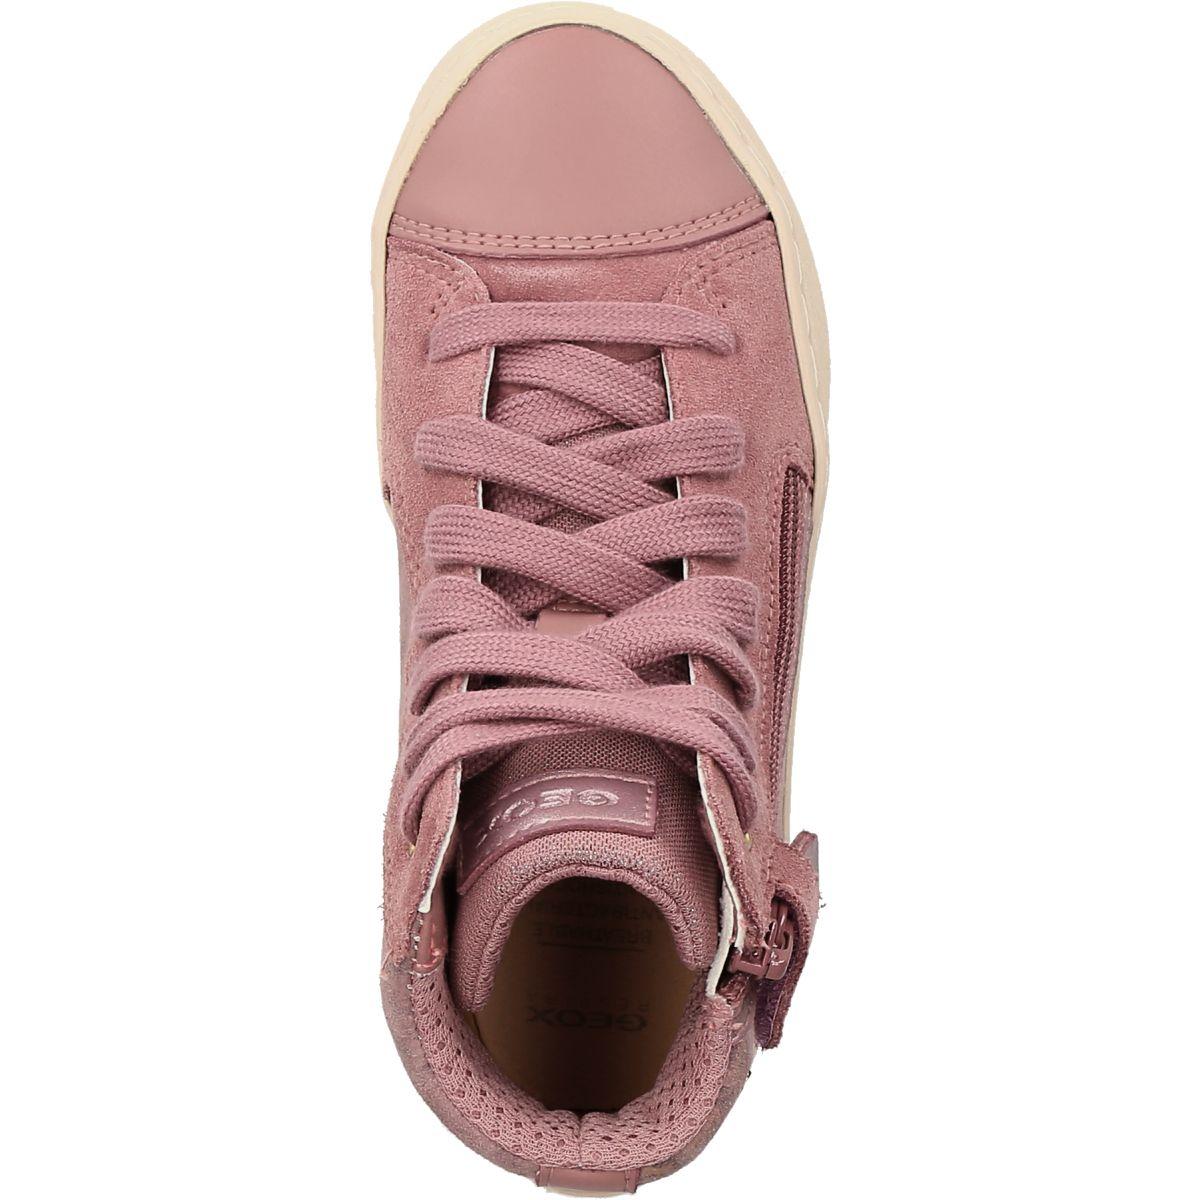 GEOX J944GD 00722 C8006 Children's shoes Pumps buy shoes at